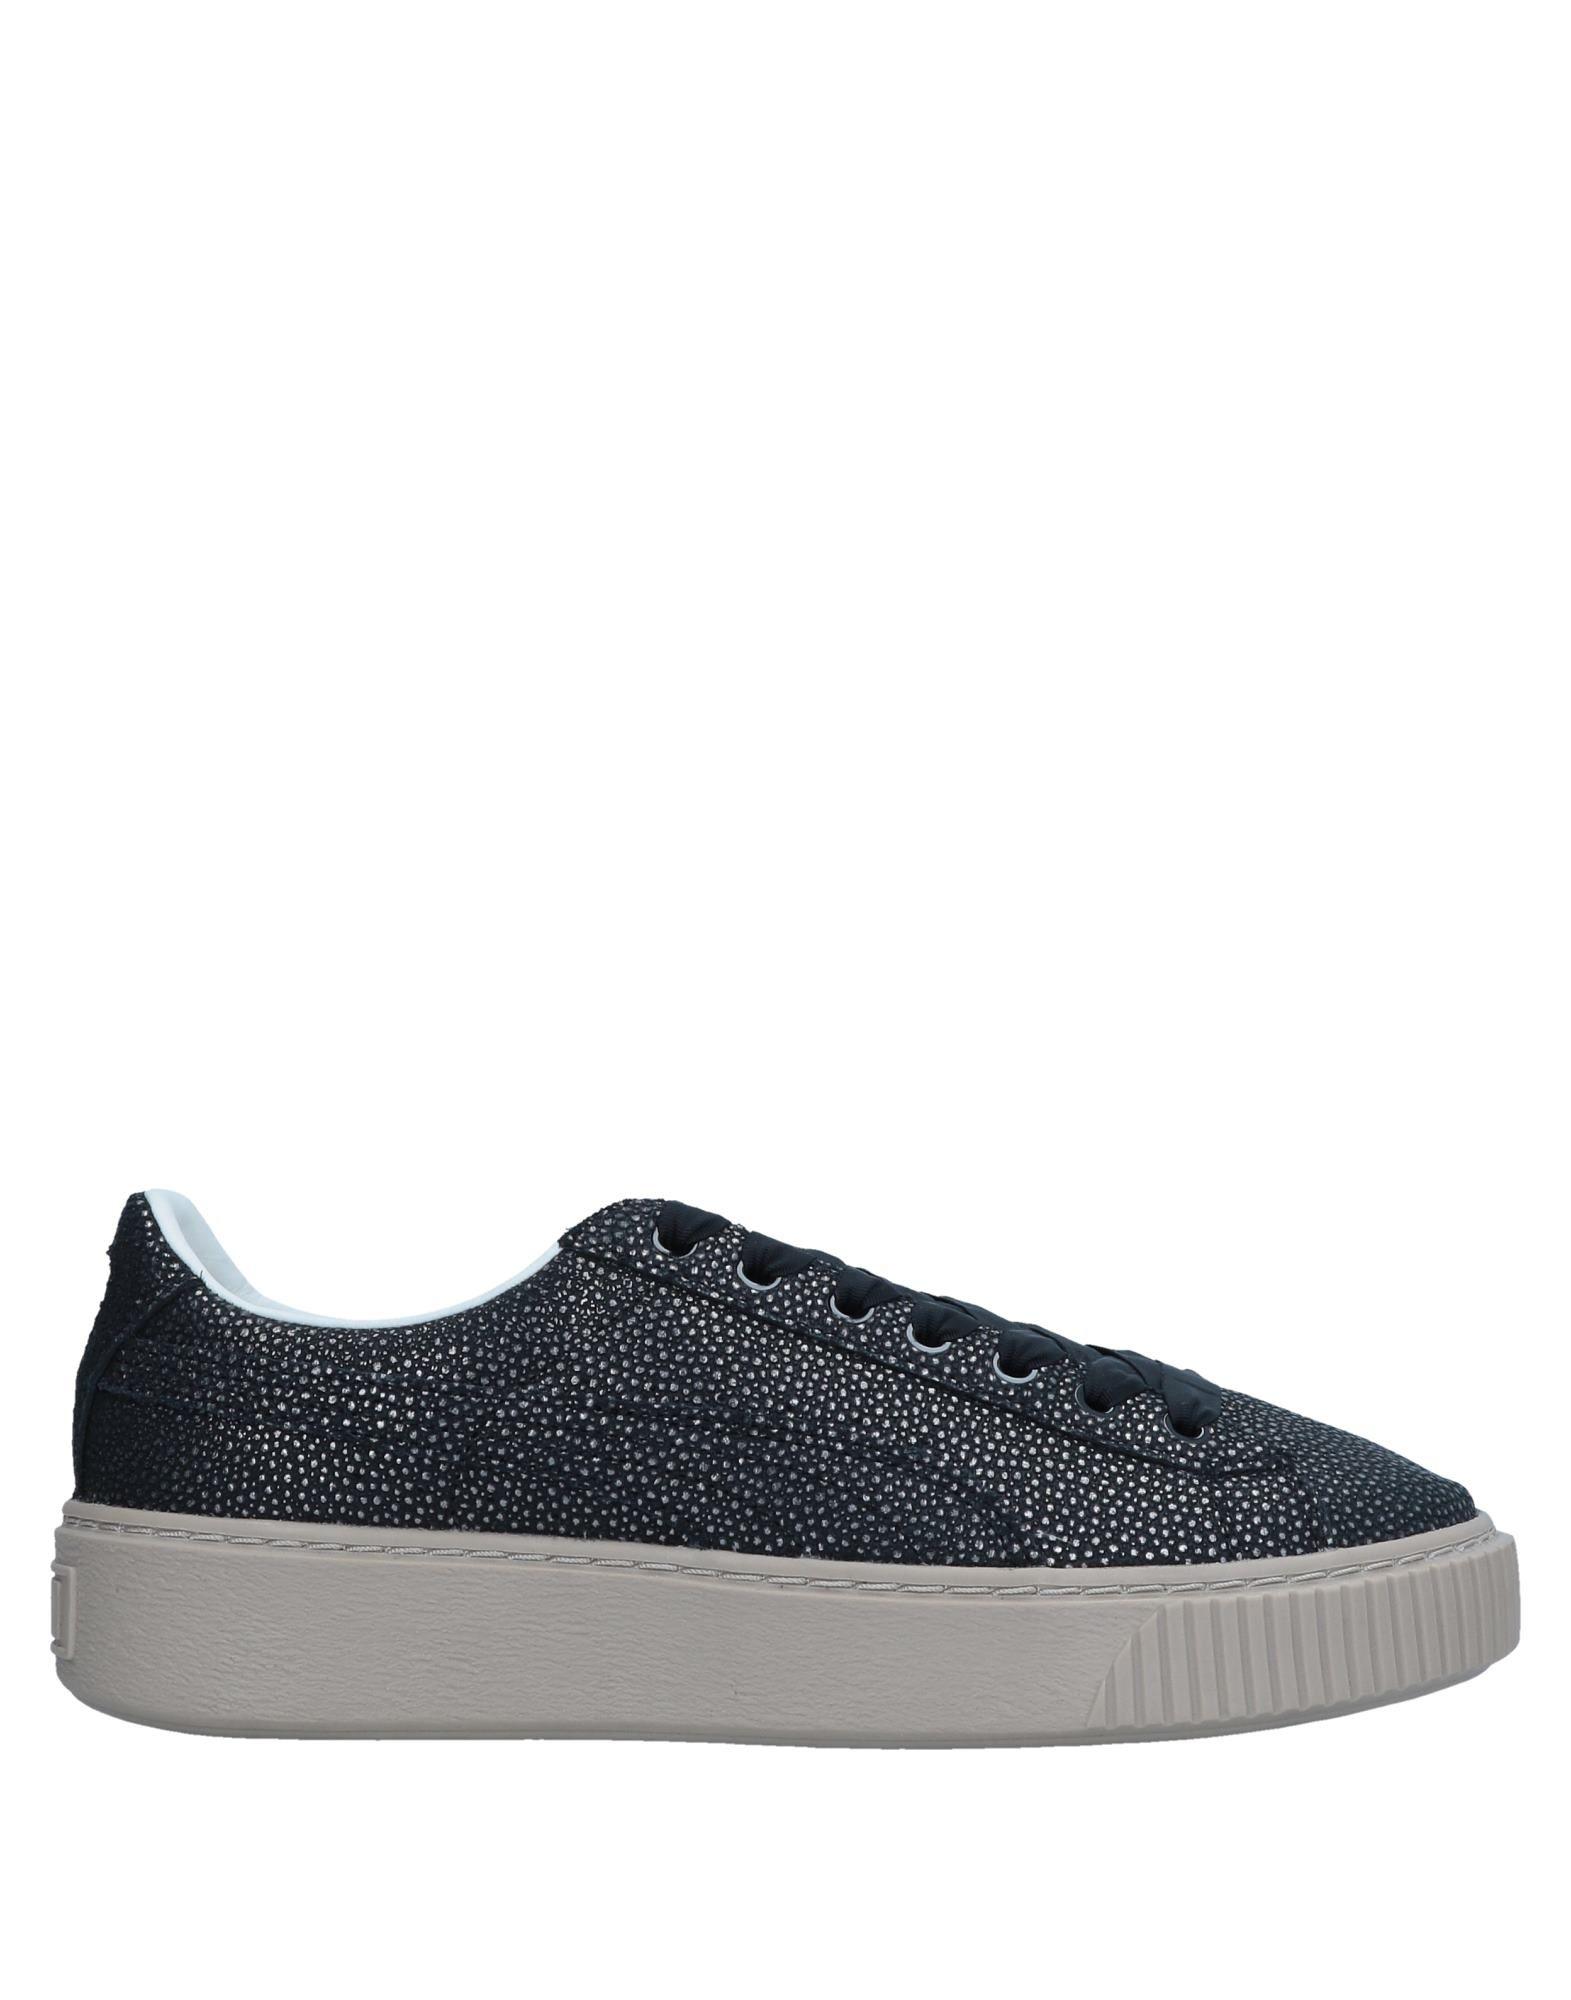 Puma Sneakers - Women  Puma Sneakers online on  Women Australia - 11557983PV b22b7e